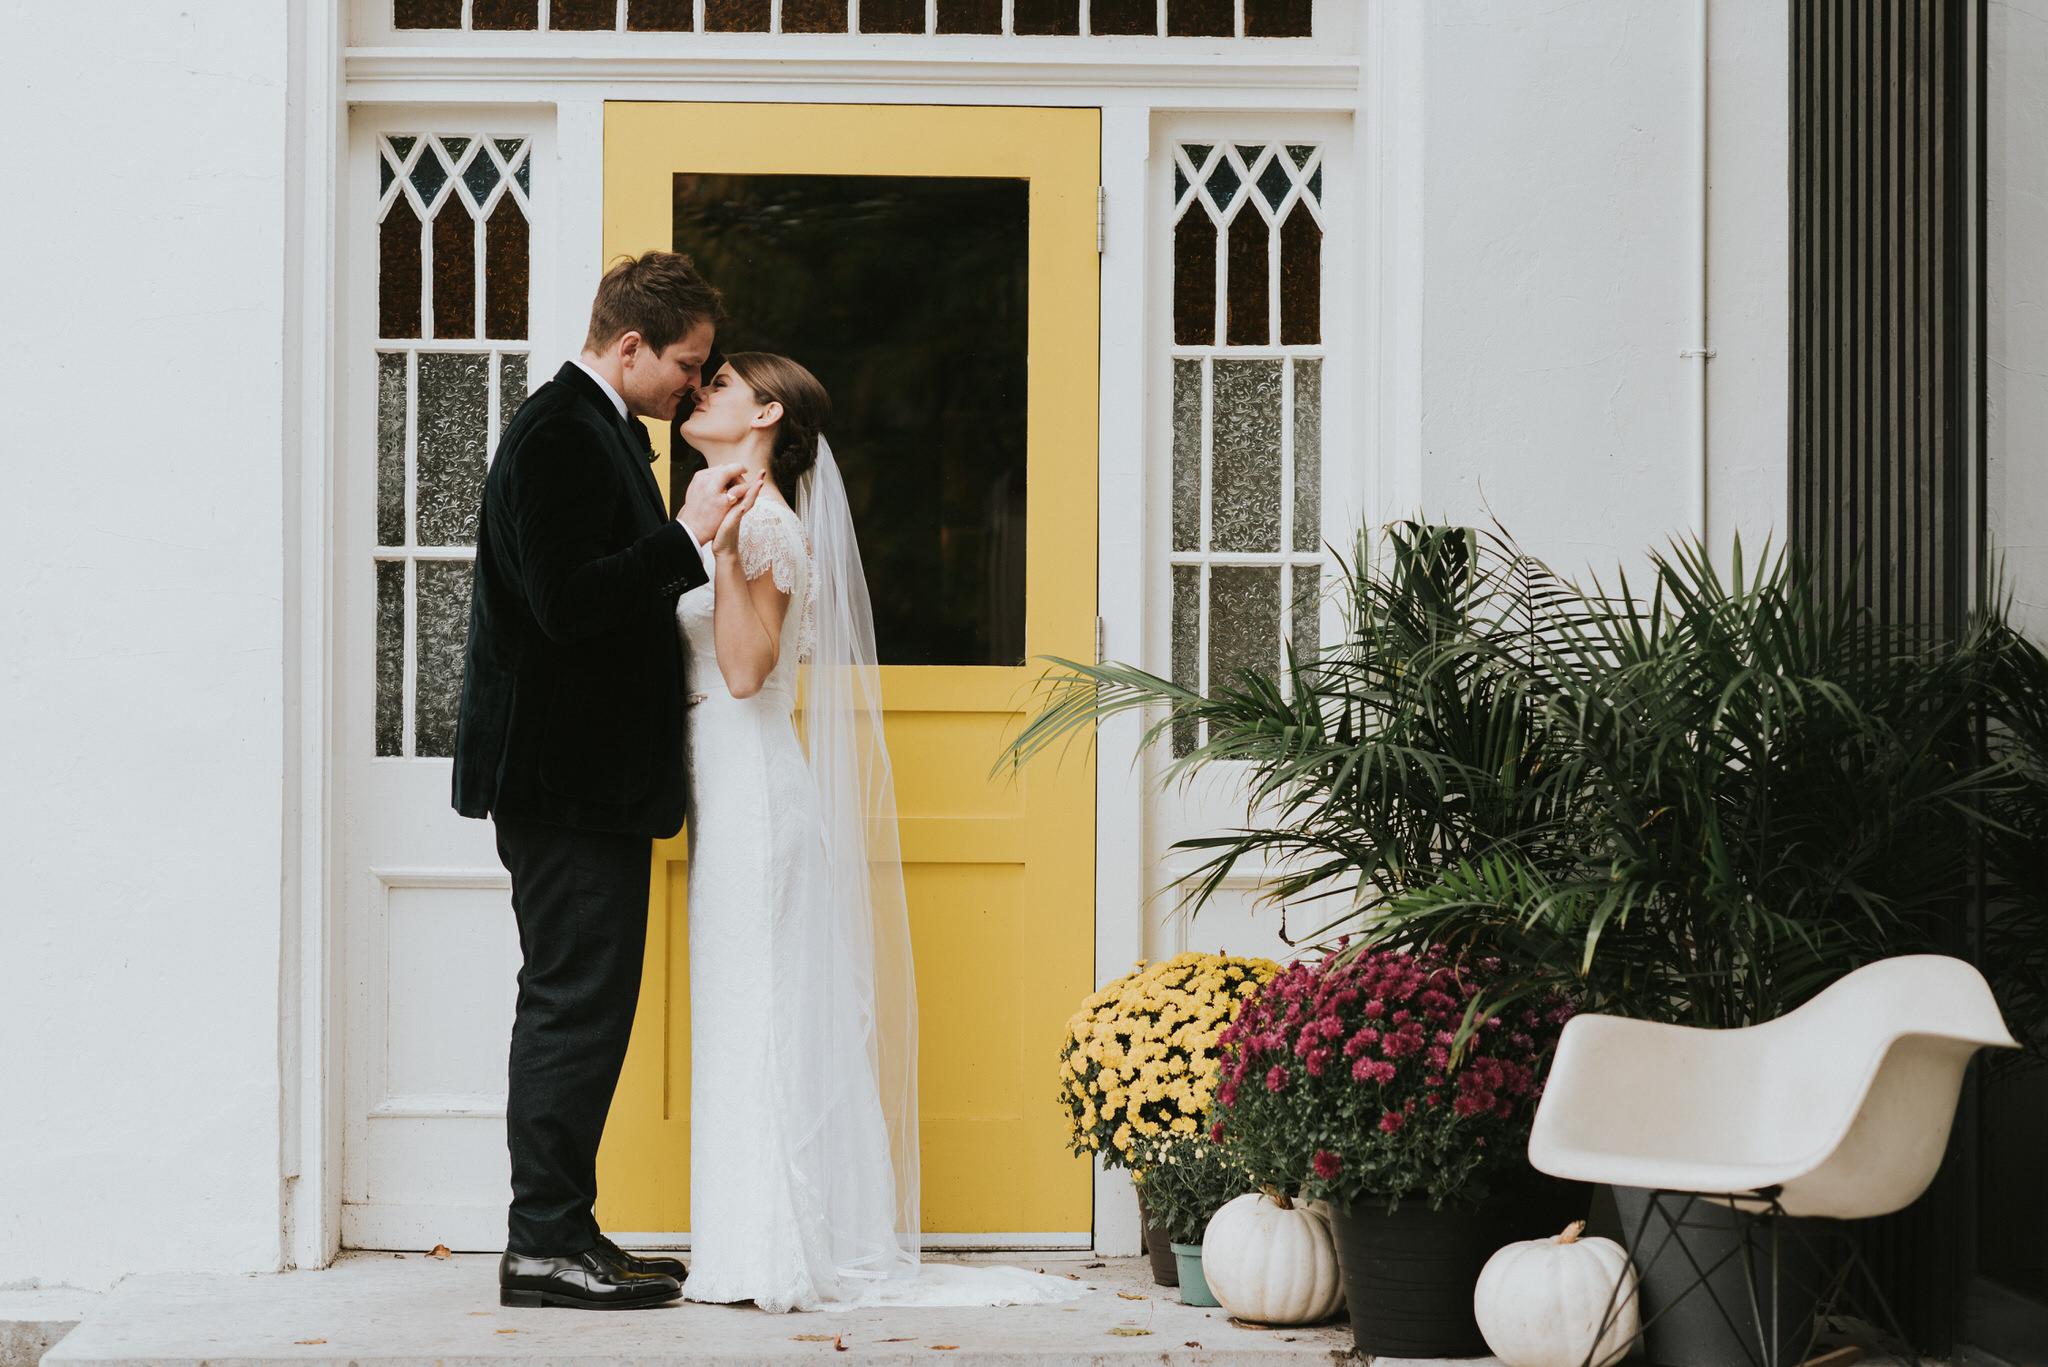 scarletoneillphotography_weddingphotography_prince edward county weddings051.JPG